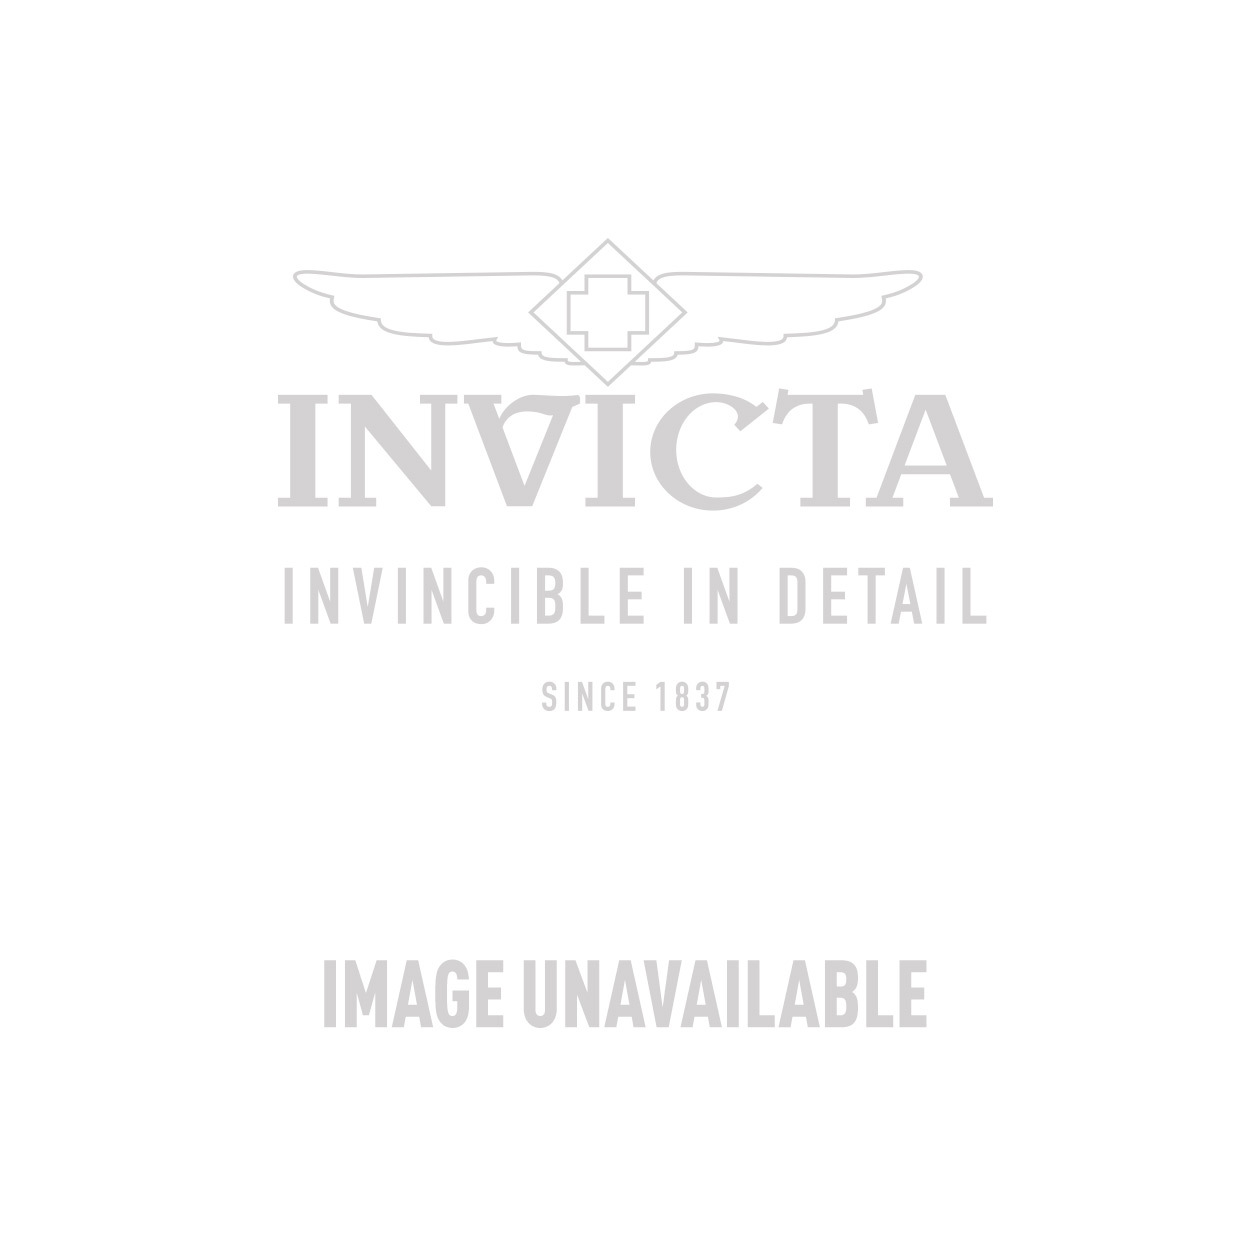 Invicta Angel Quartz Watch - Gold, Stainless Steel case with Steel, Gold tone Stainless Steel band - Model 19256